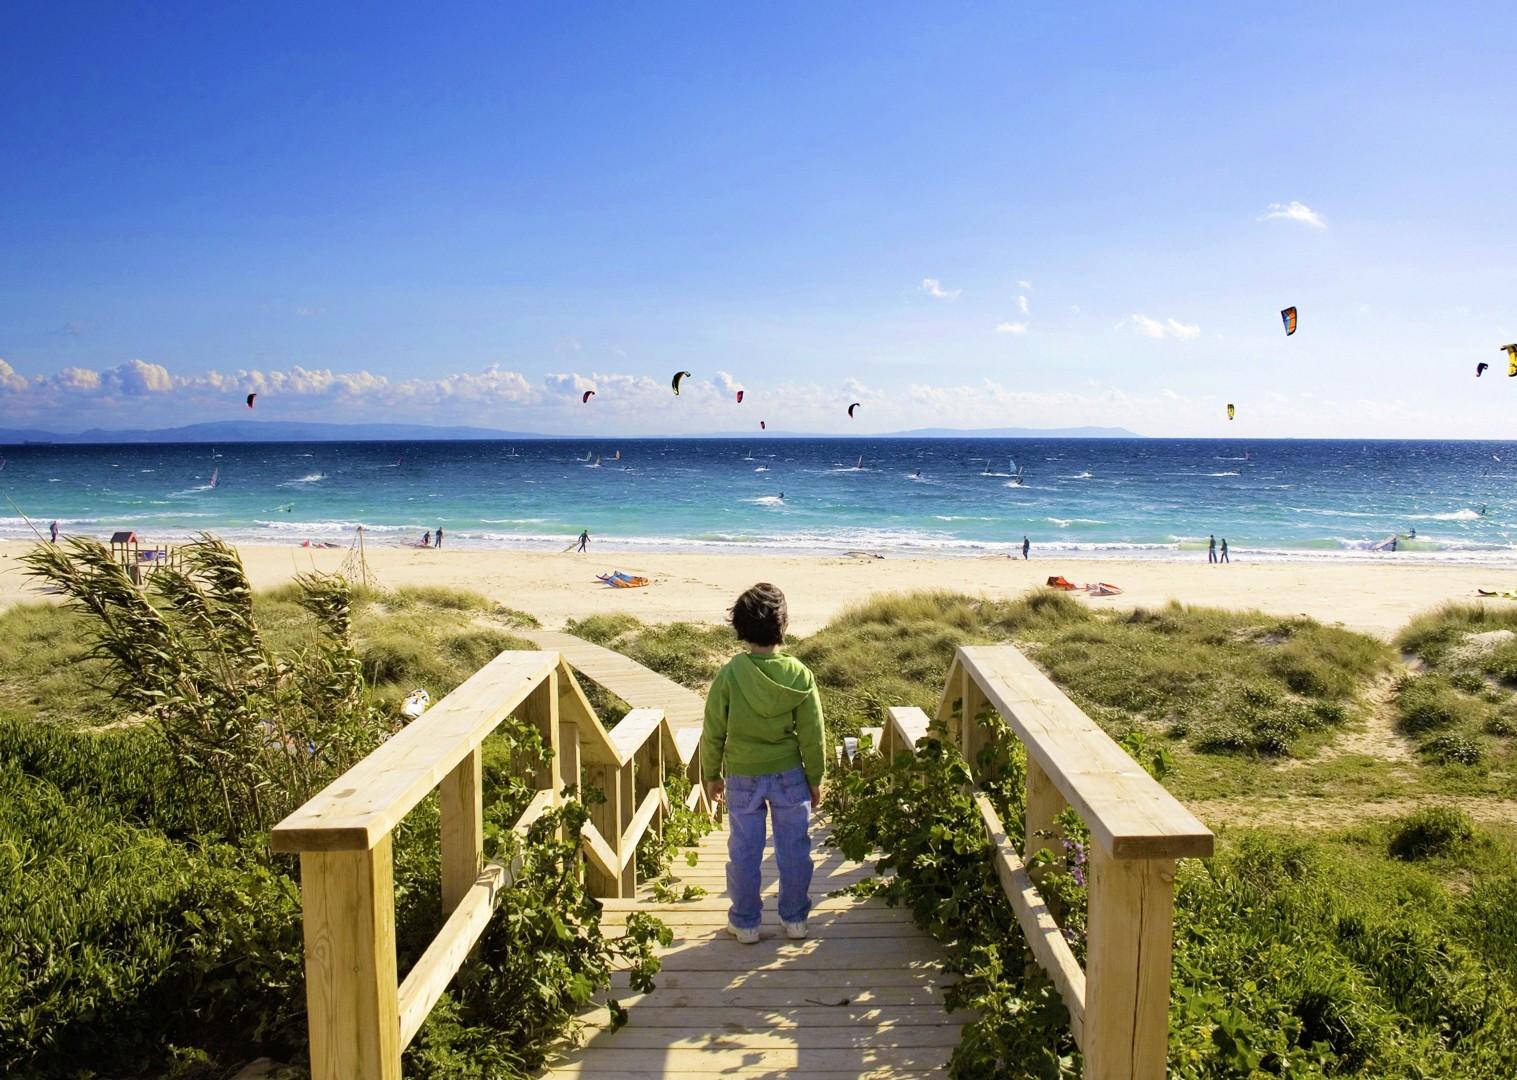 _Holiday.550.17765.jpg - Southern Spain - Coastal Adventurer - Family Cycling